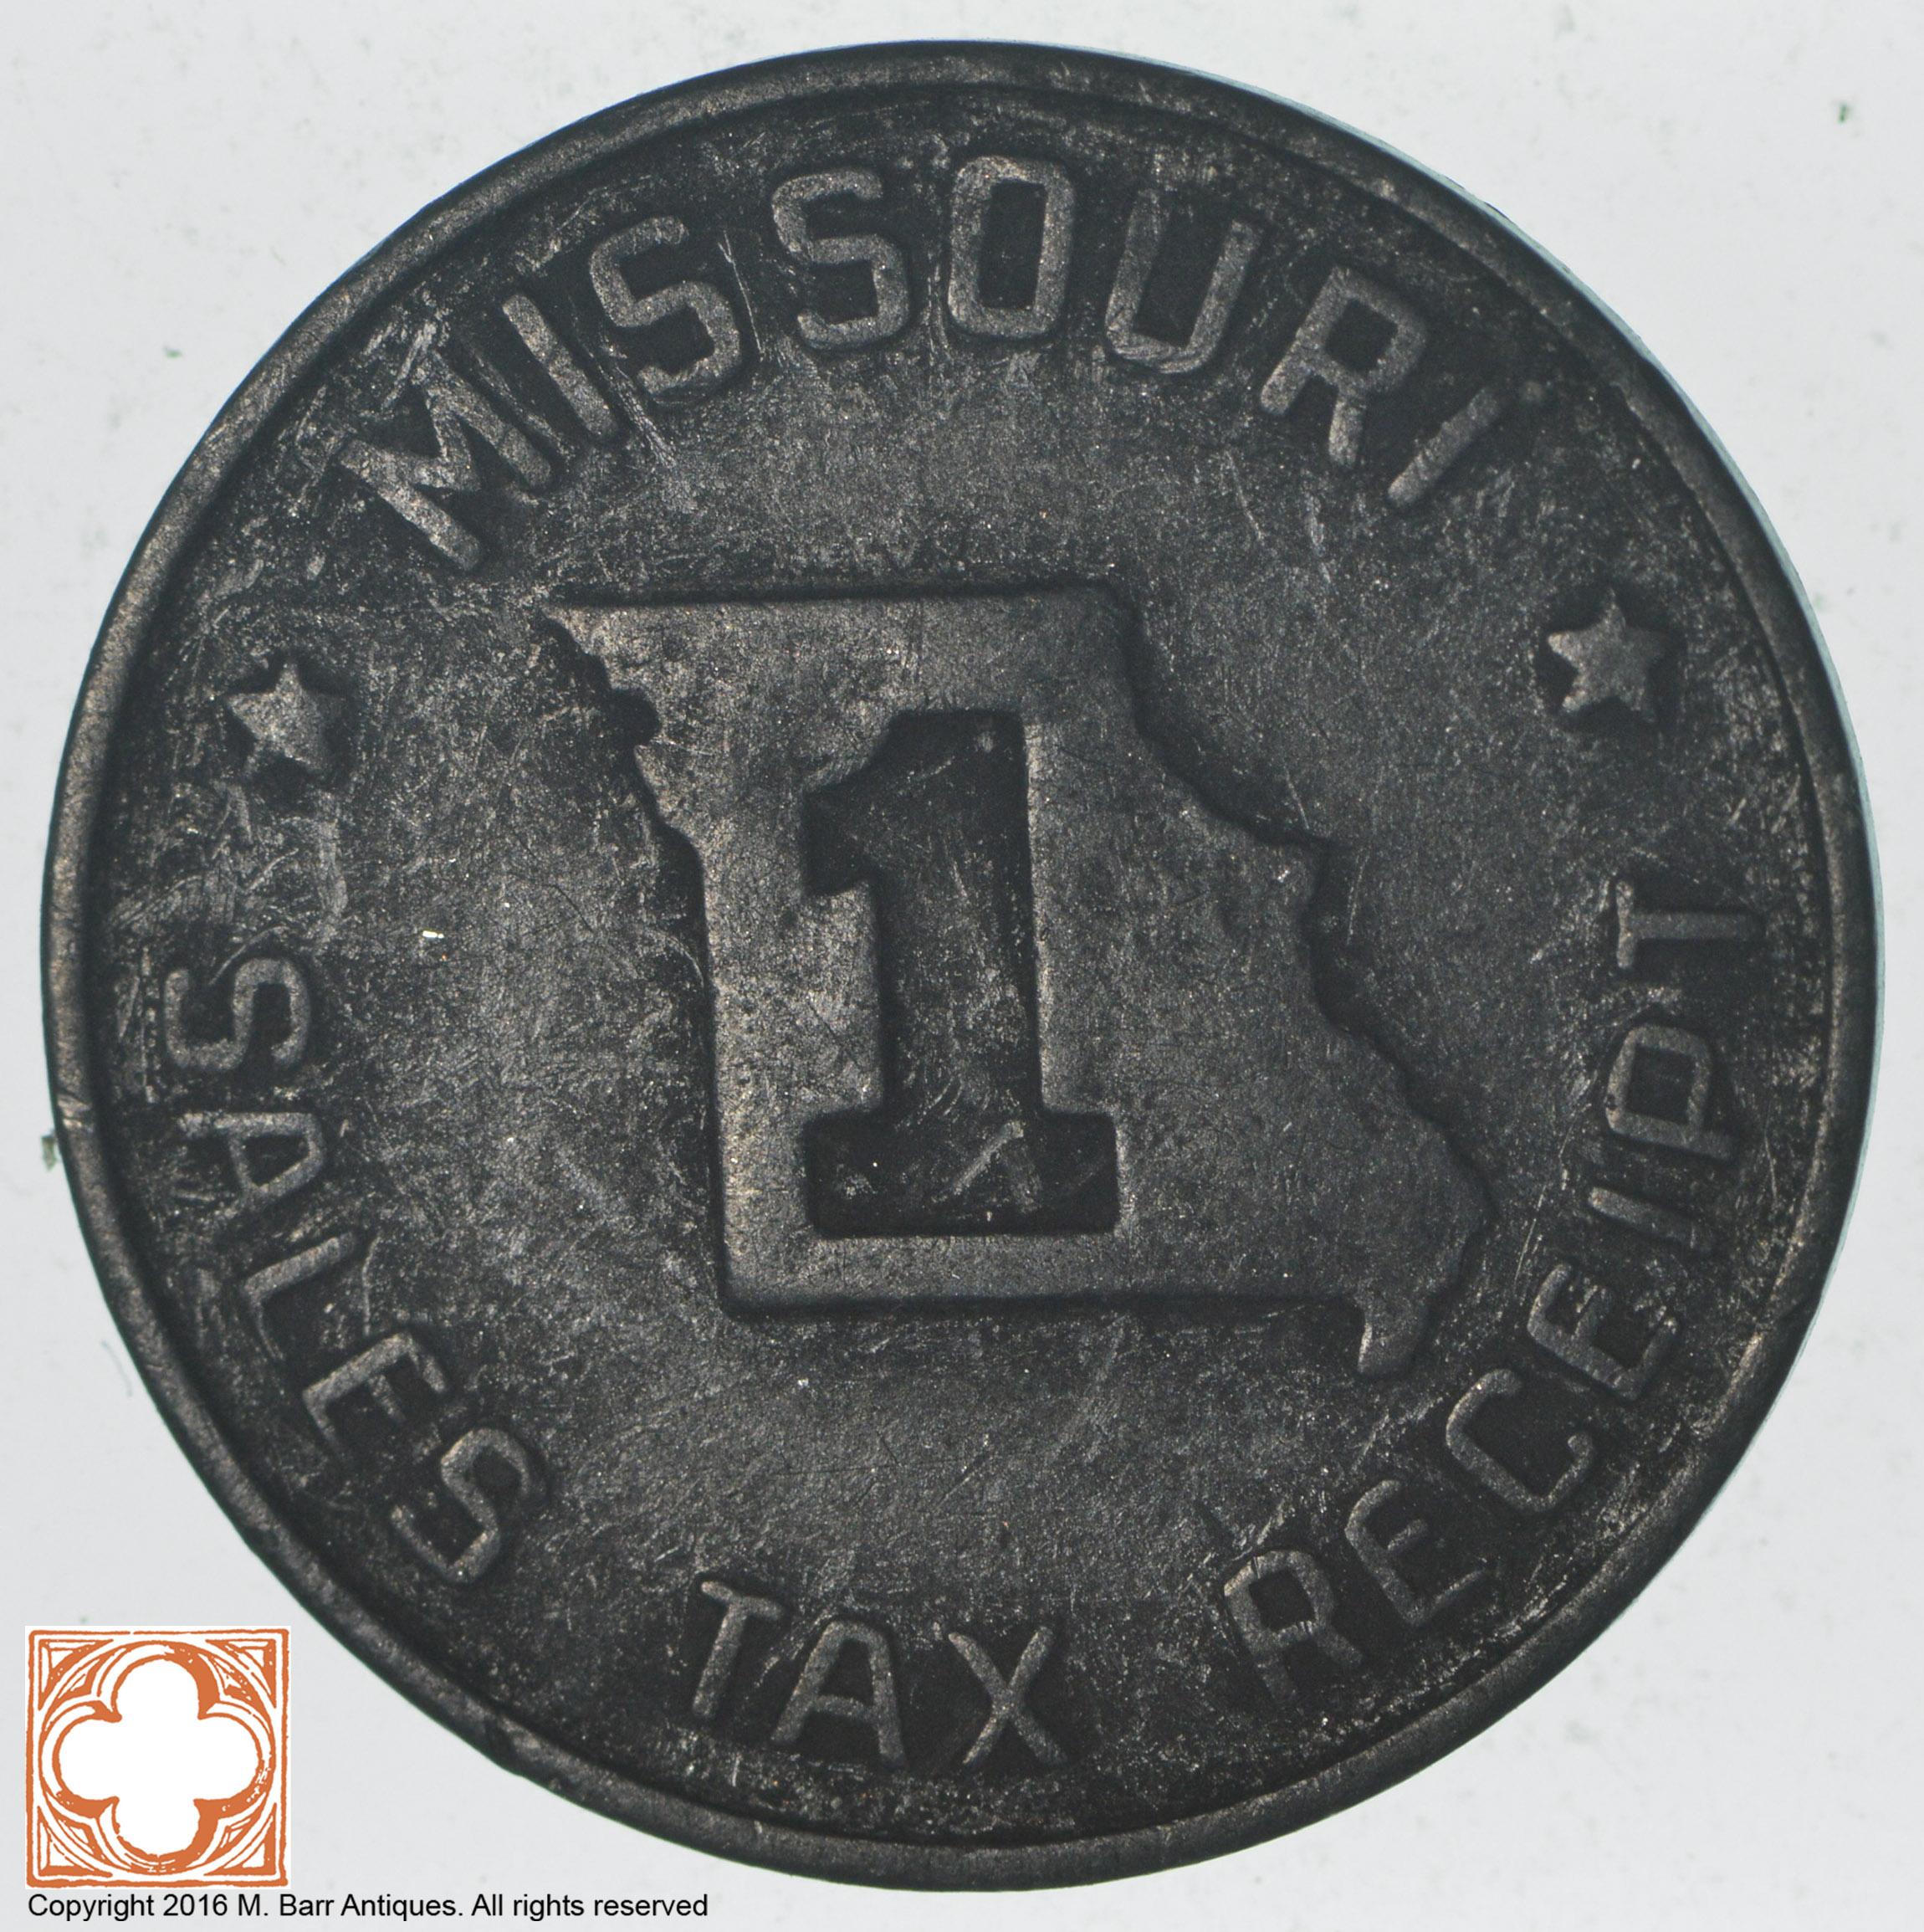 Missouri Property Tax Auction